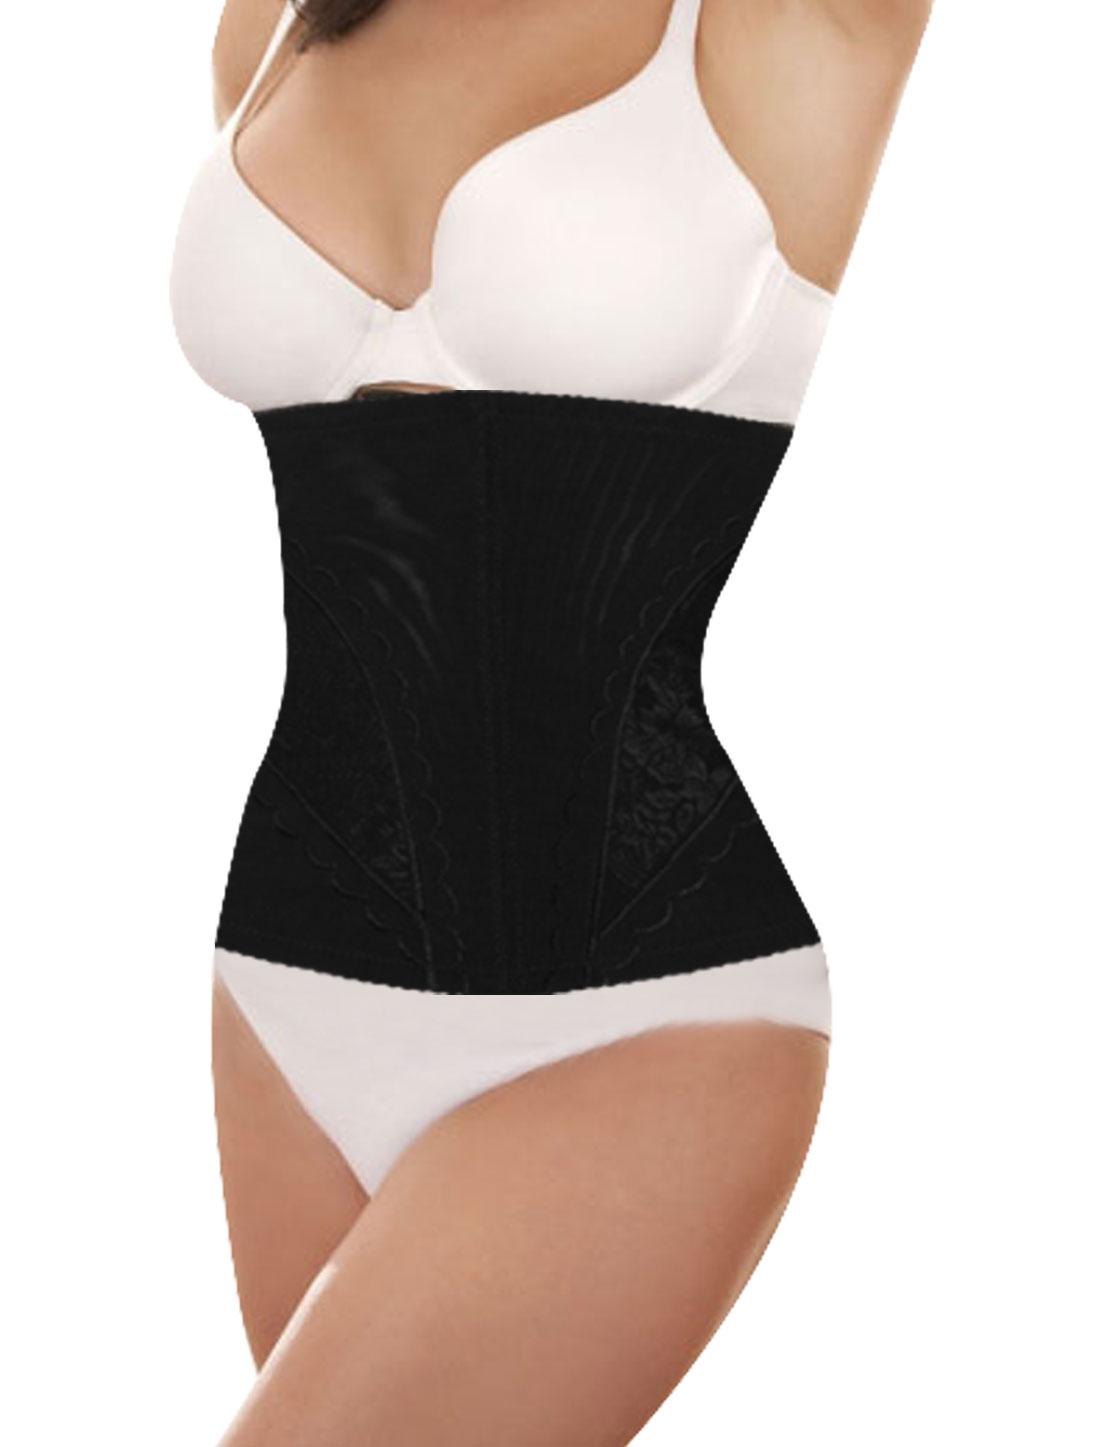 Black Florals Pattern Waist Cincher Tummy Control Underbust Girdle Corset L